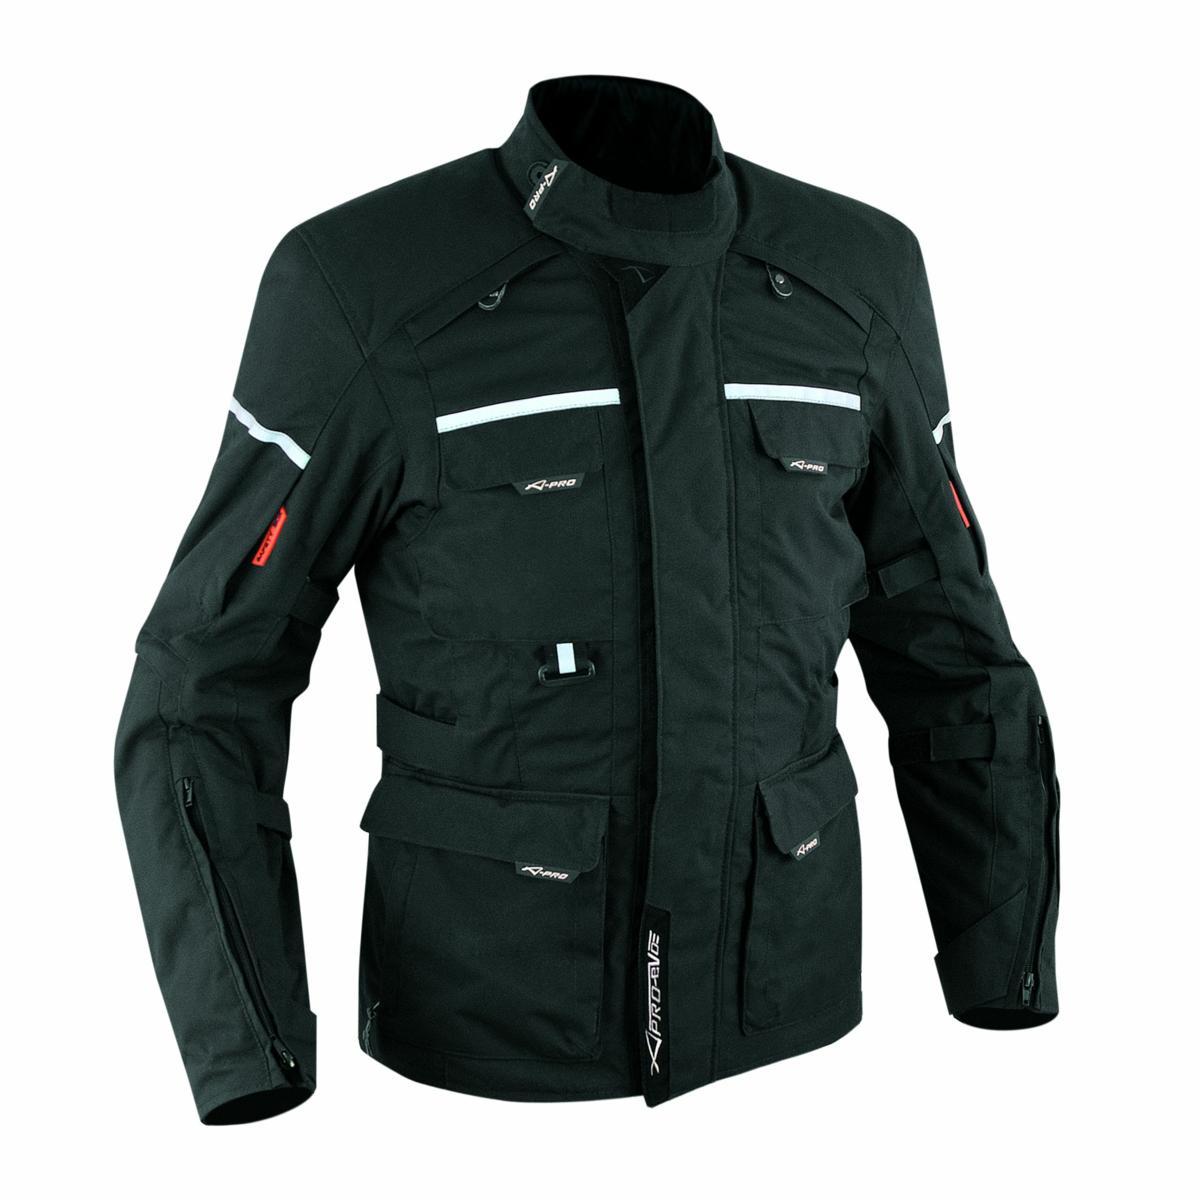 Tela-impermeable-chaqueta-de-la-Moto-extraible-acolchado-termico-Negro